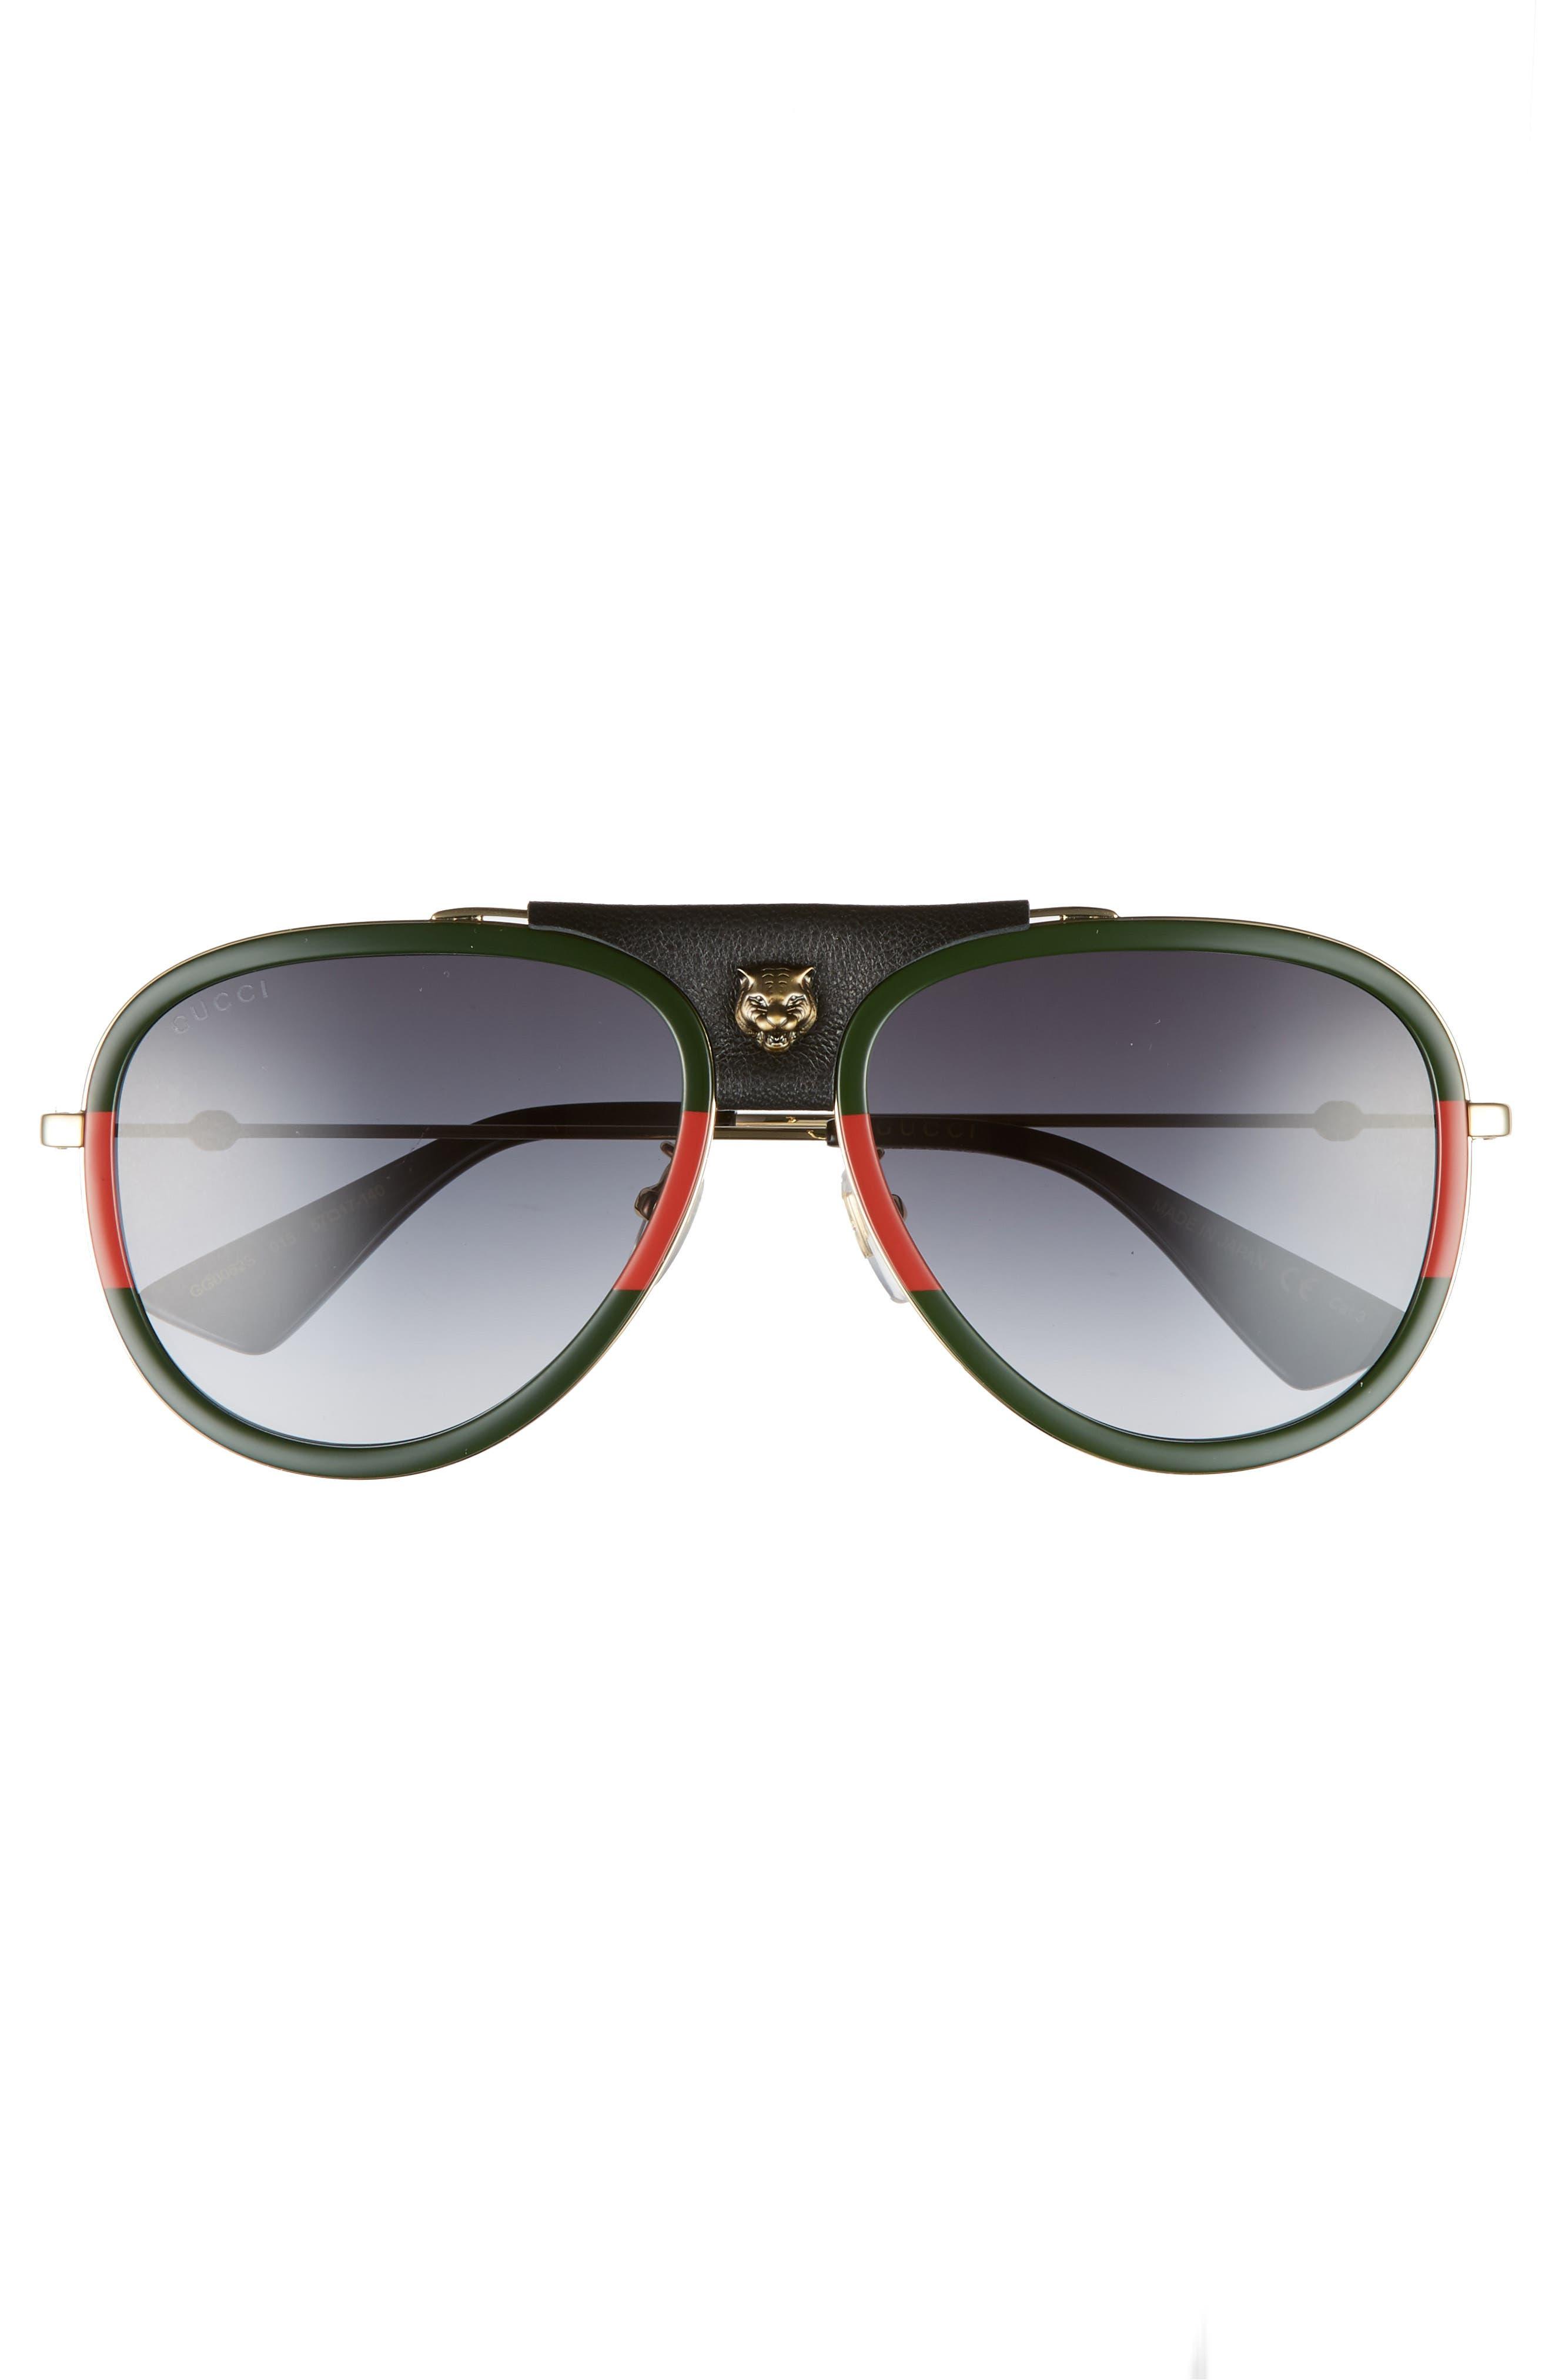 57mm Metal Aviator Sunglasses,                             Alternate thumbnail 3, color,                             GOLD